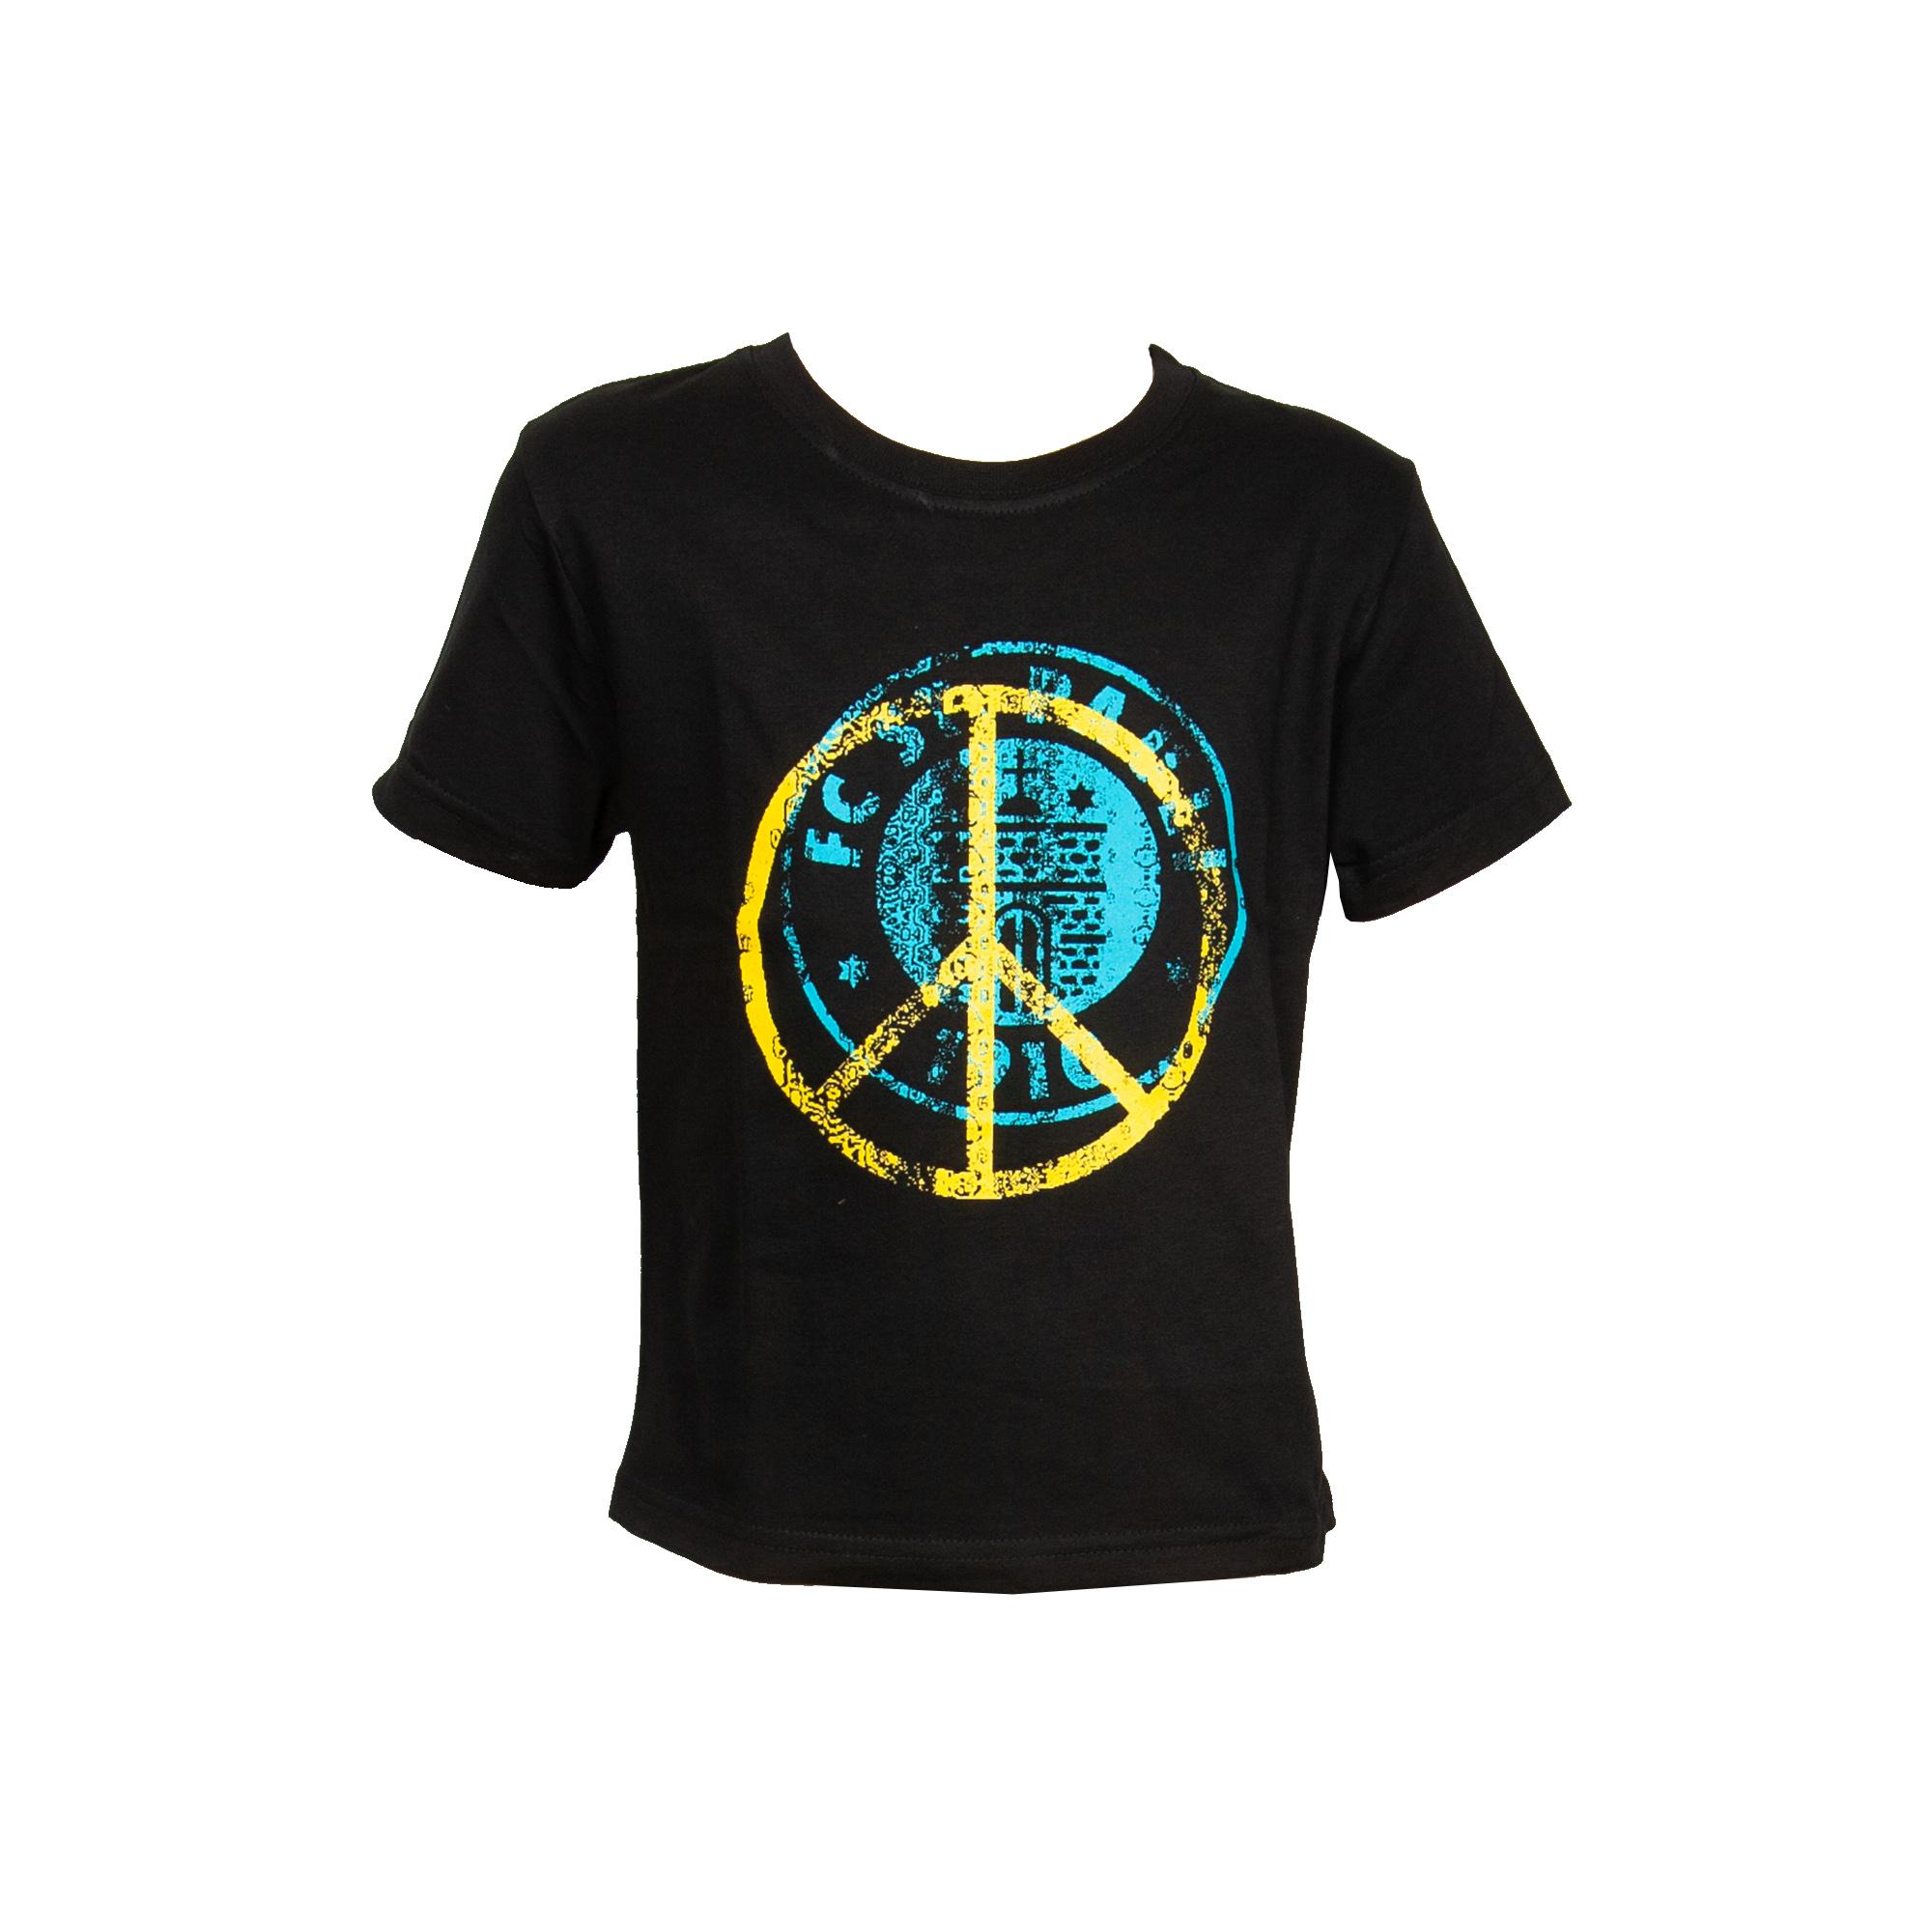 FC St. Pauli - Kinder T-Shirt Peace Türkis-Gelb - schwarz